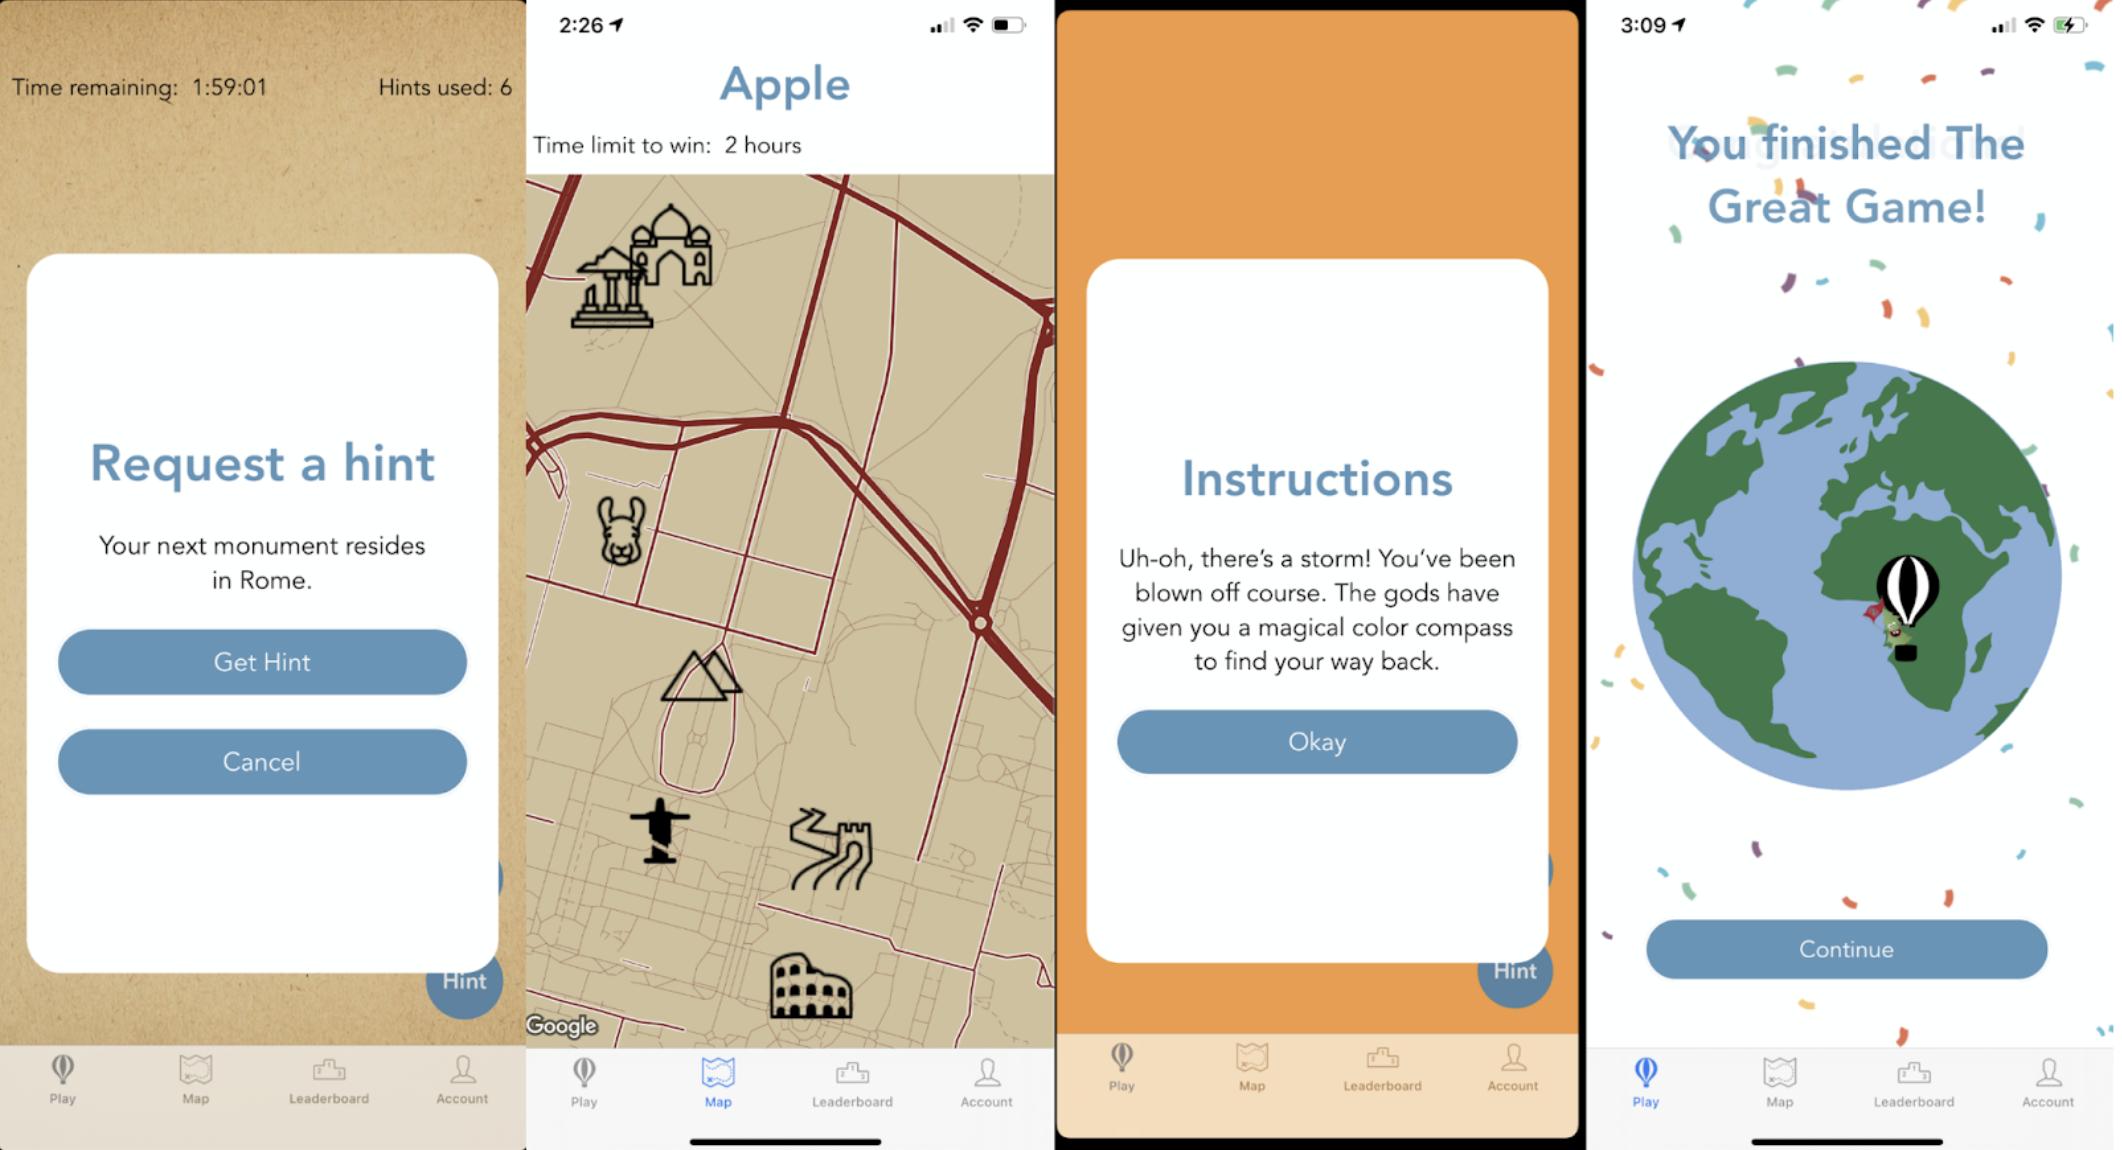 Screenshots of the application screens.